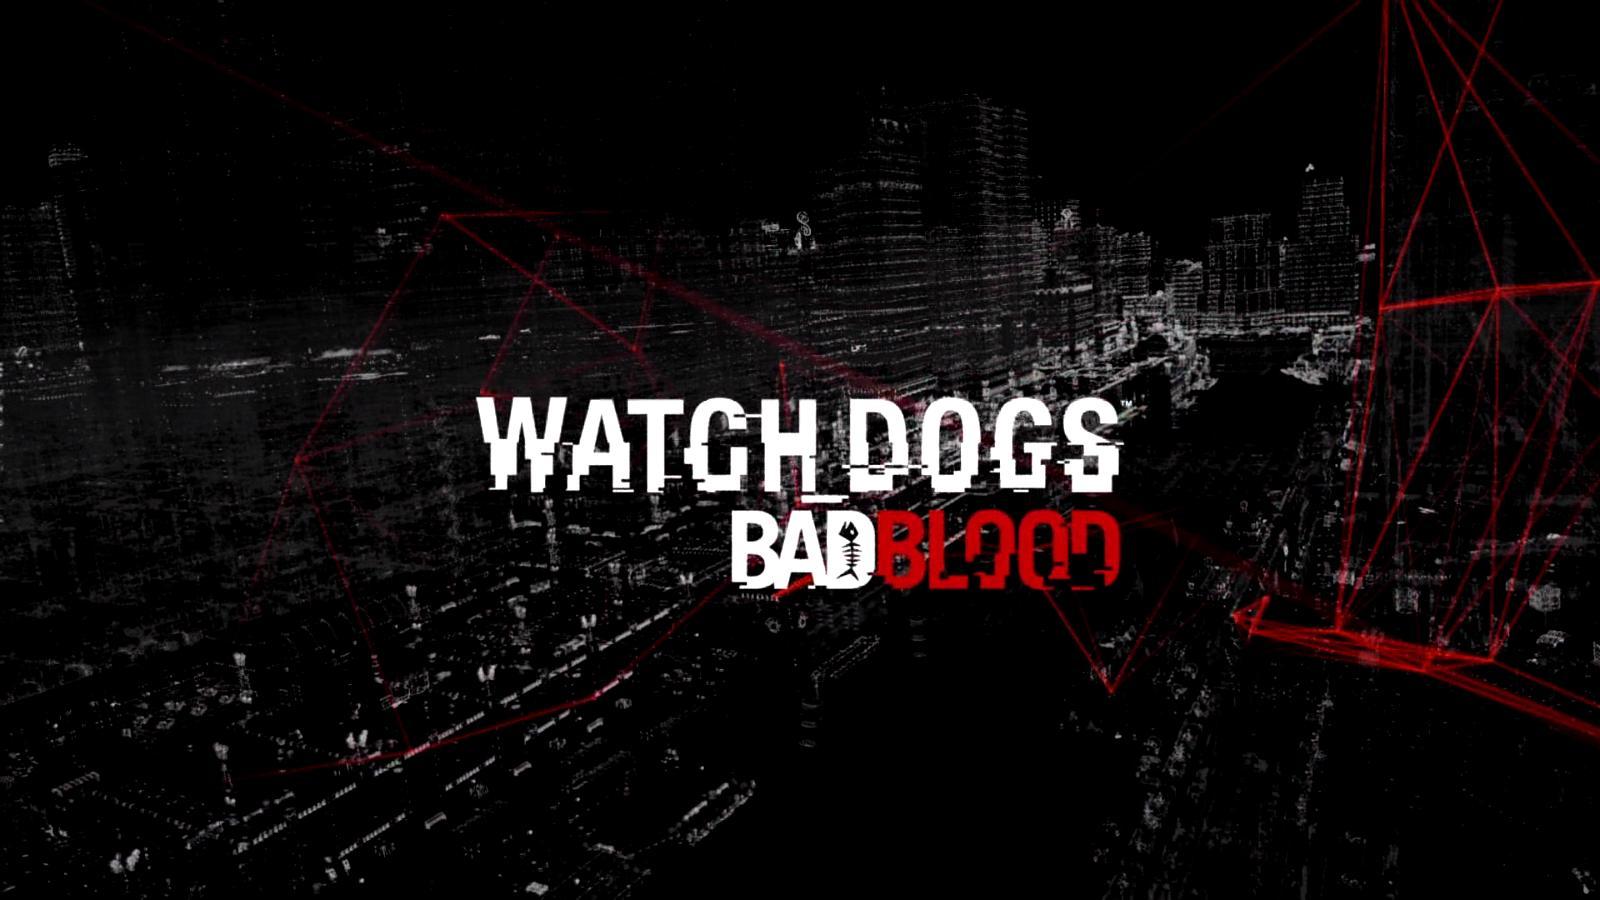 Watch_Dogs-Badblood